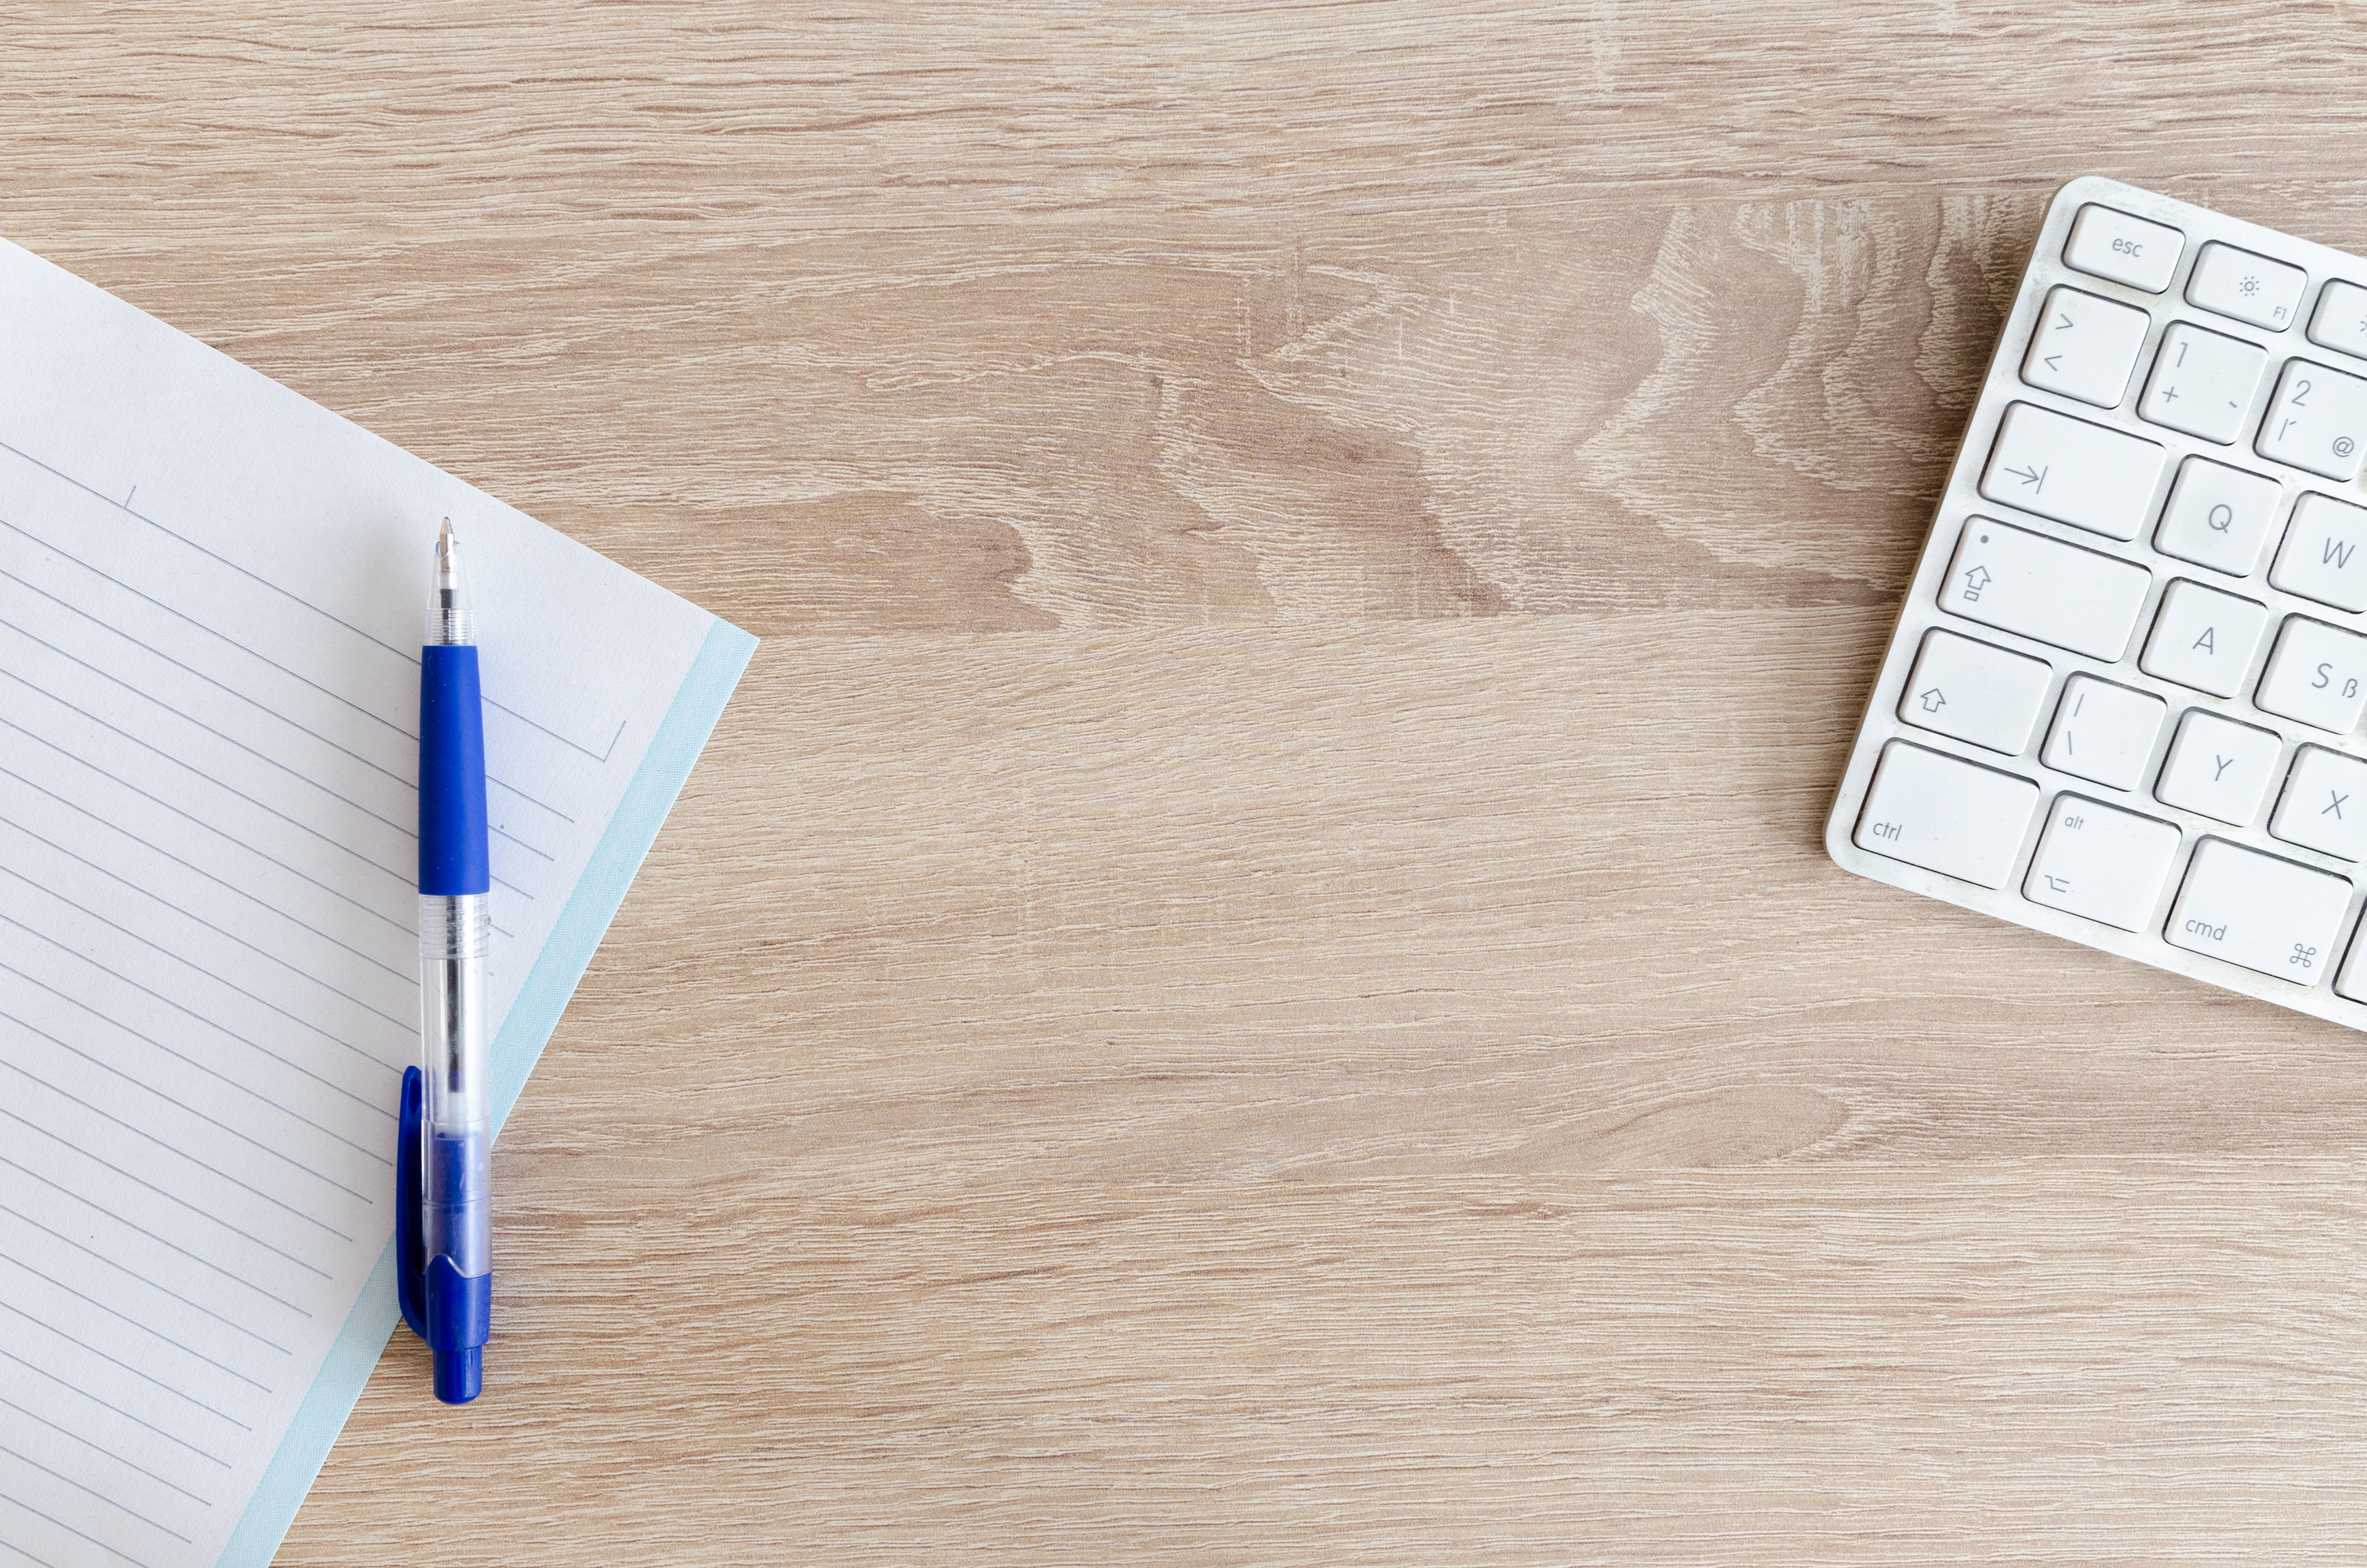 English Careers-Five Steps Towards Building Your Freelance Business-Rachel Skelton